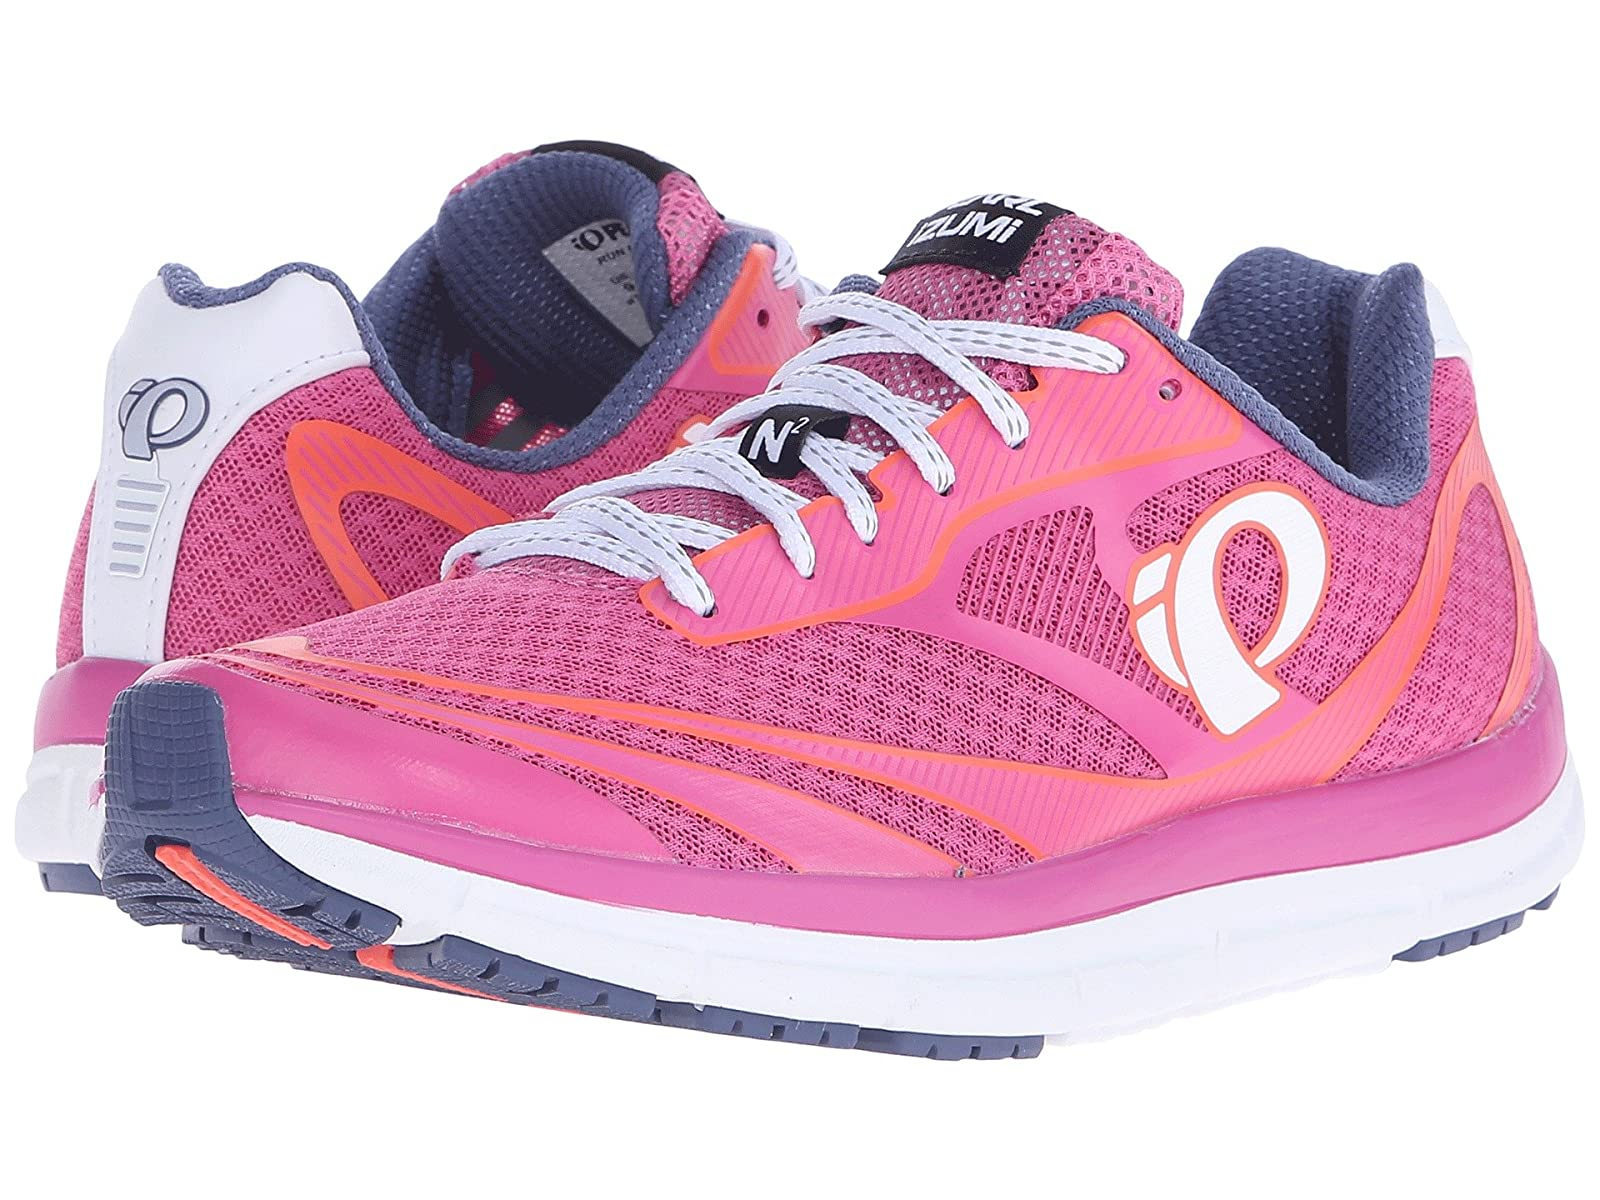 Pearl Izumi EM Road N2 v3Cheap and distinctive eye-catching shoes